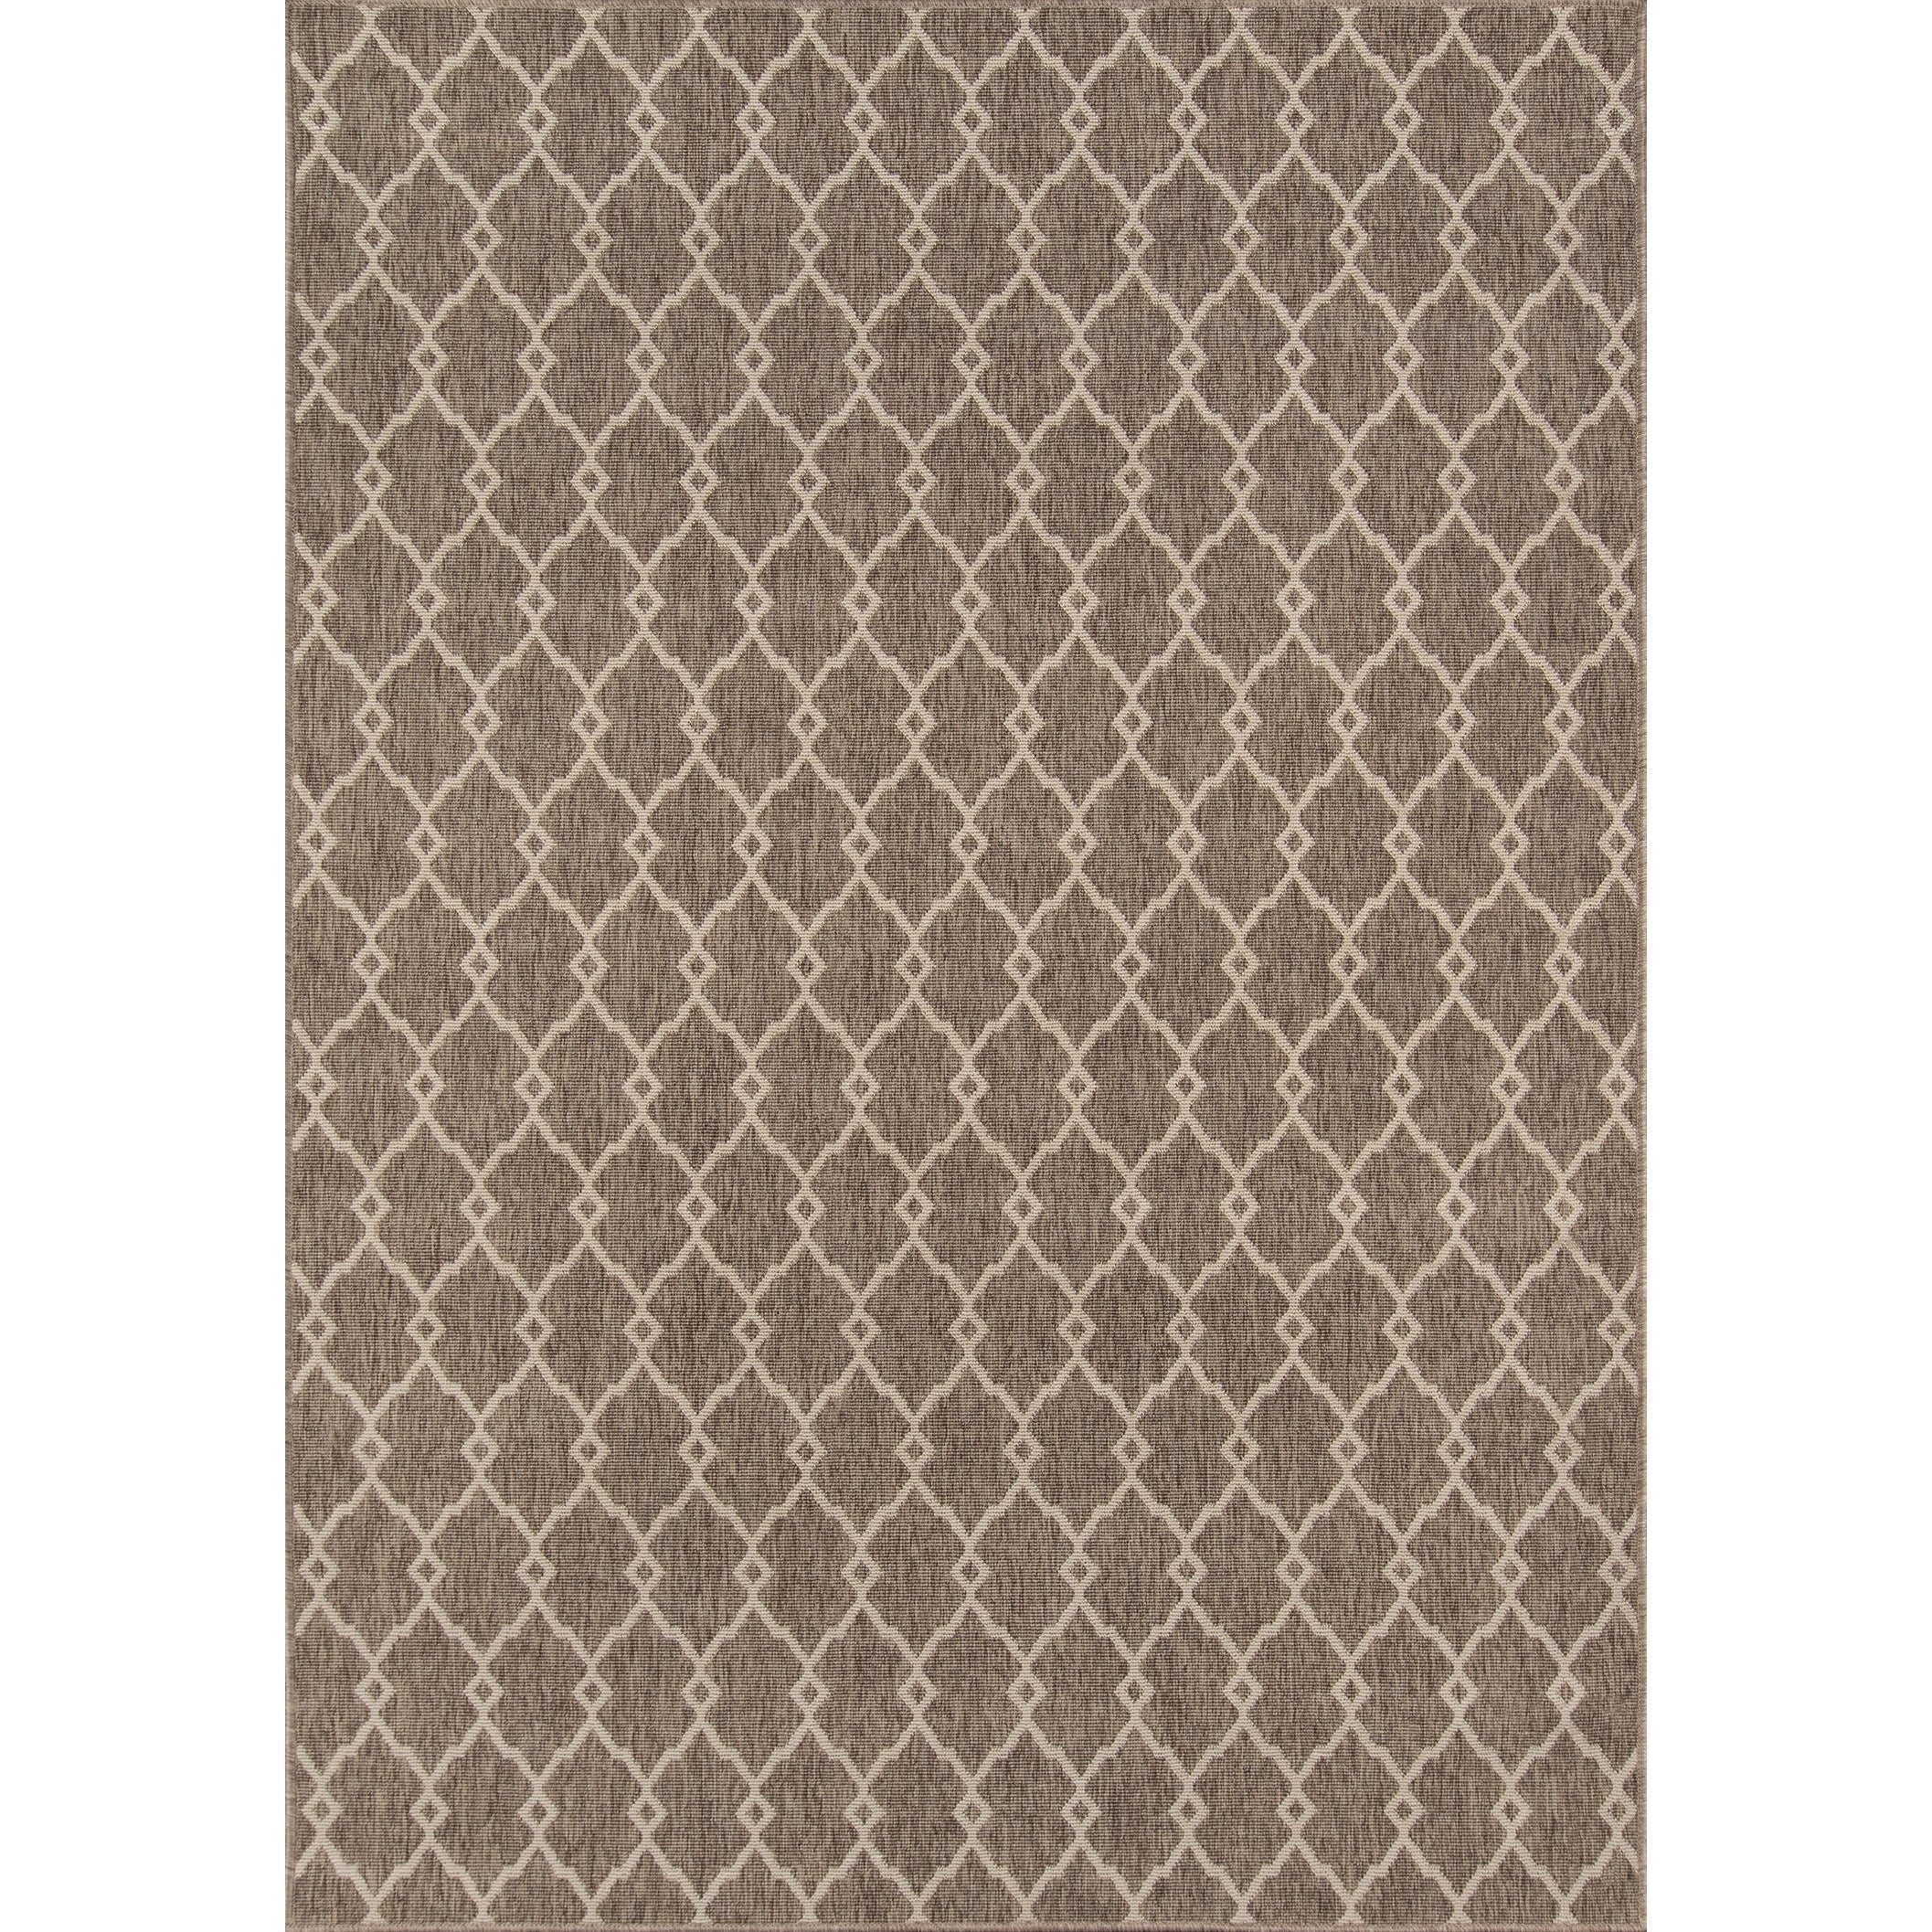 Shop momeni baja trellis machine made polypropylene taupe indoor outdoor rug 86 x 13 free shipping today overstock com 23176308